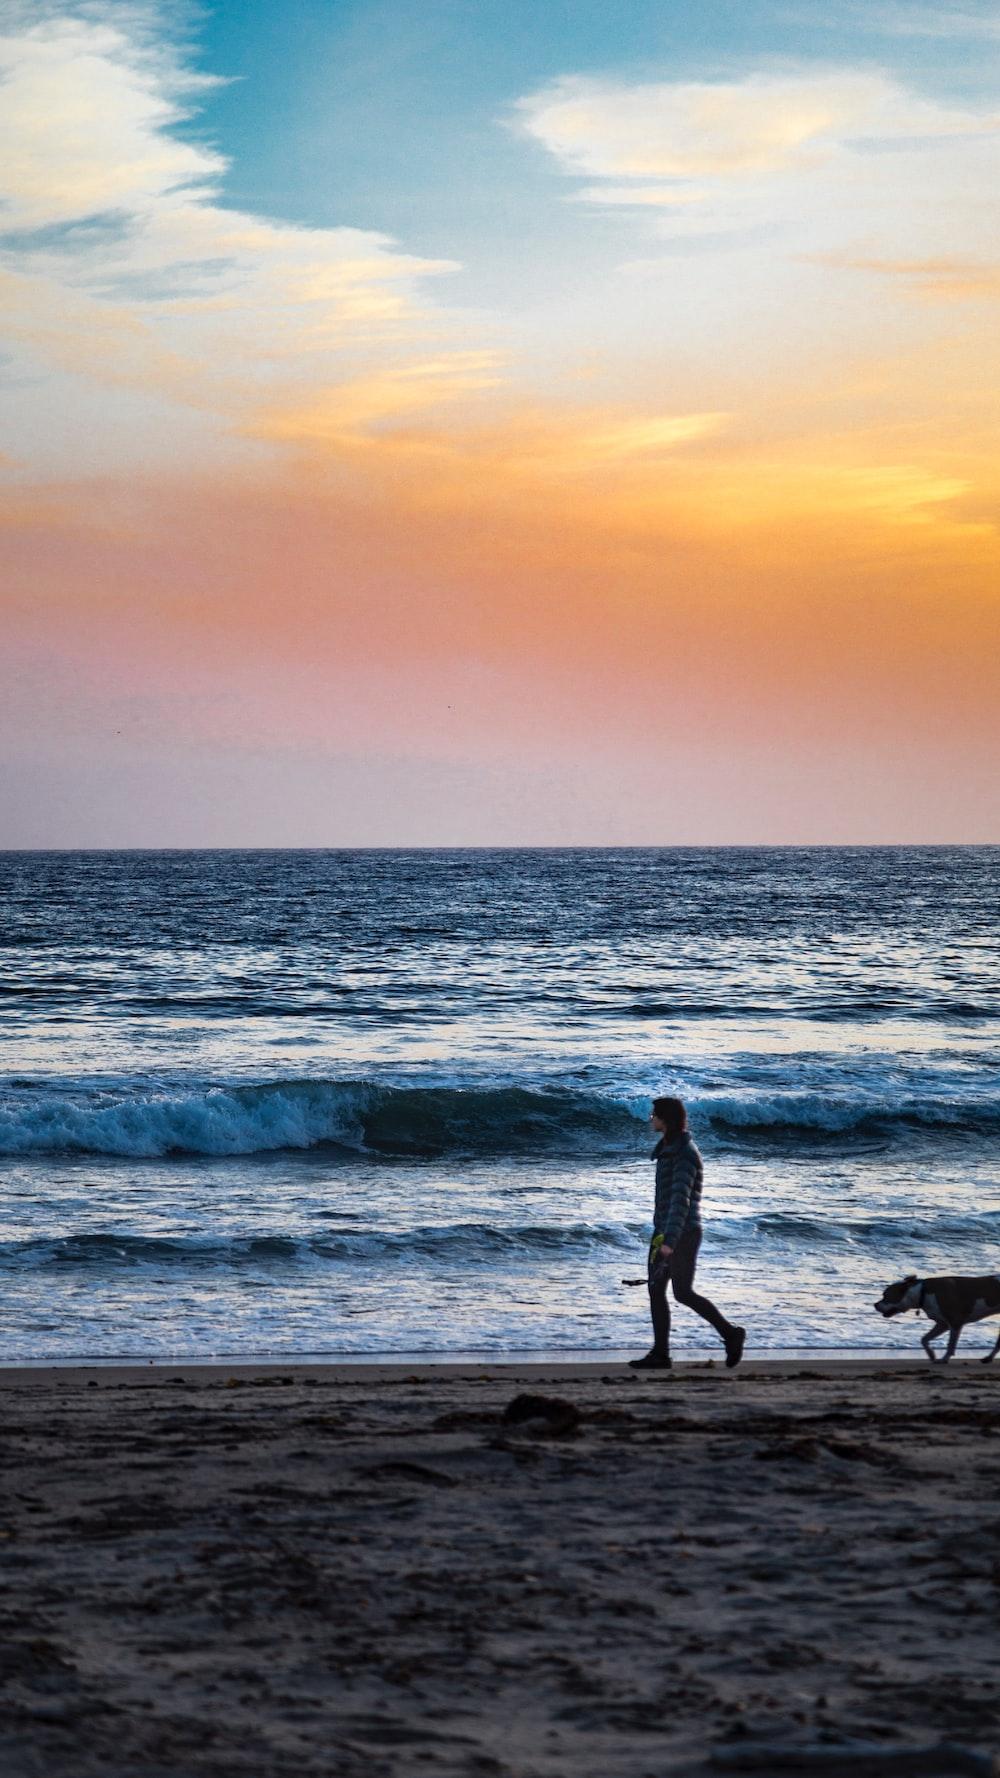 person and dog walking on seashore at daytime